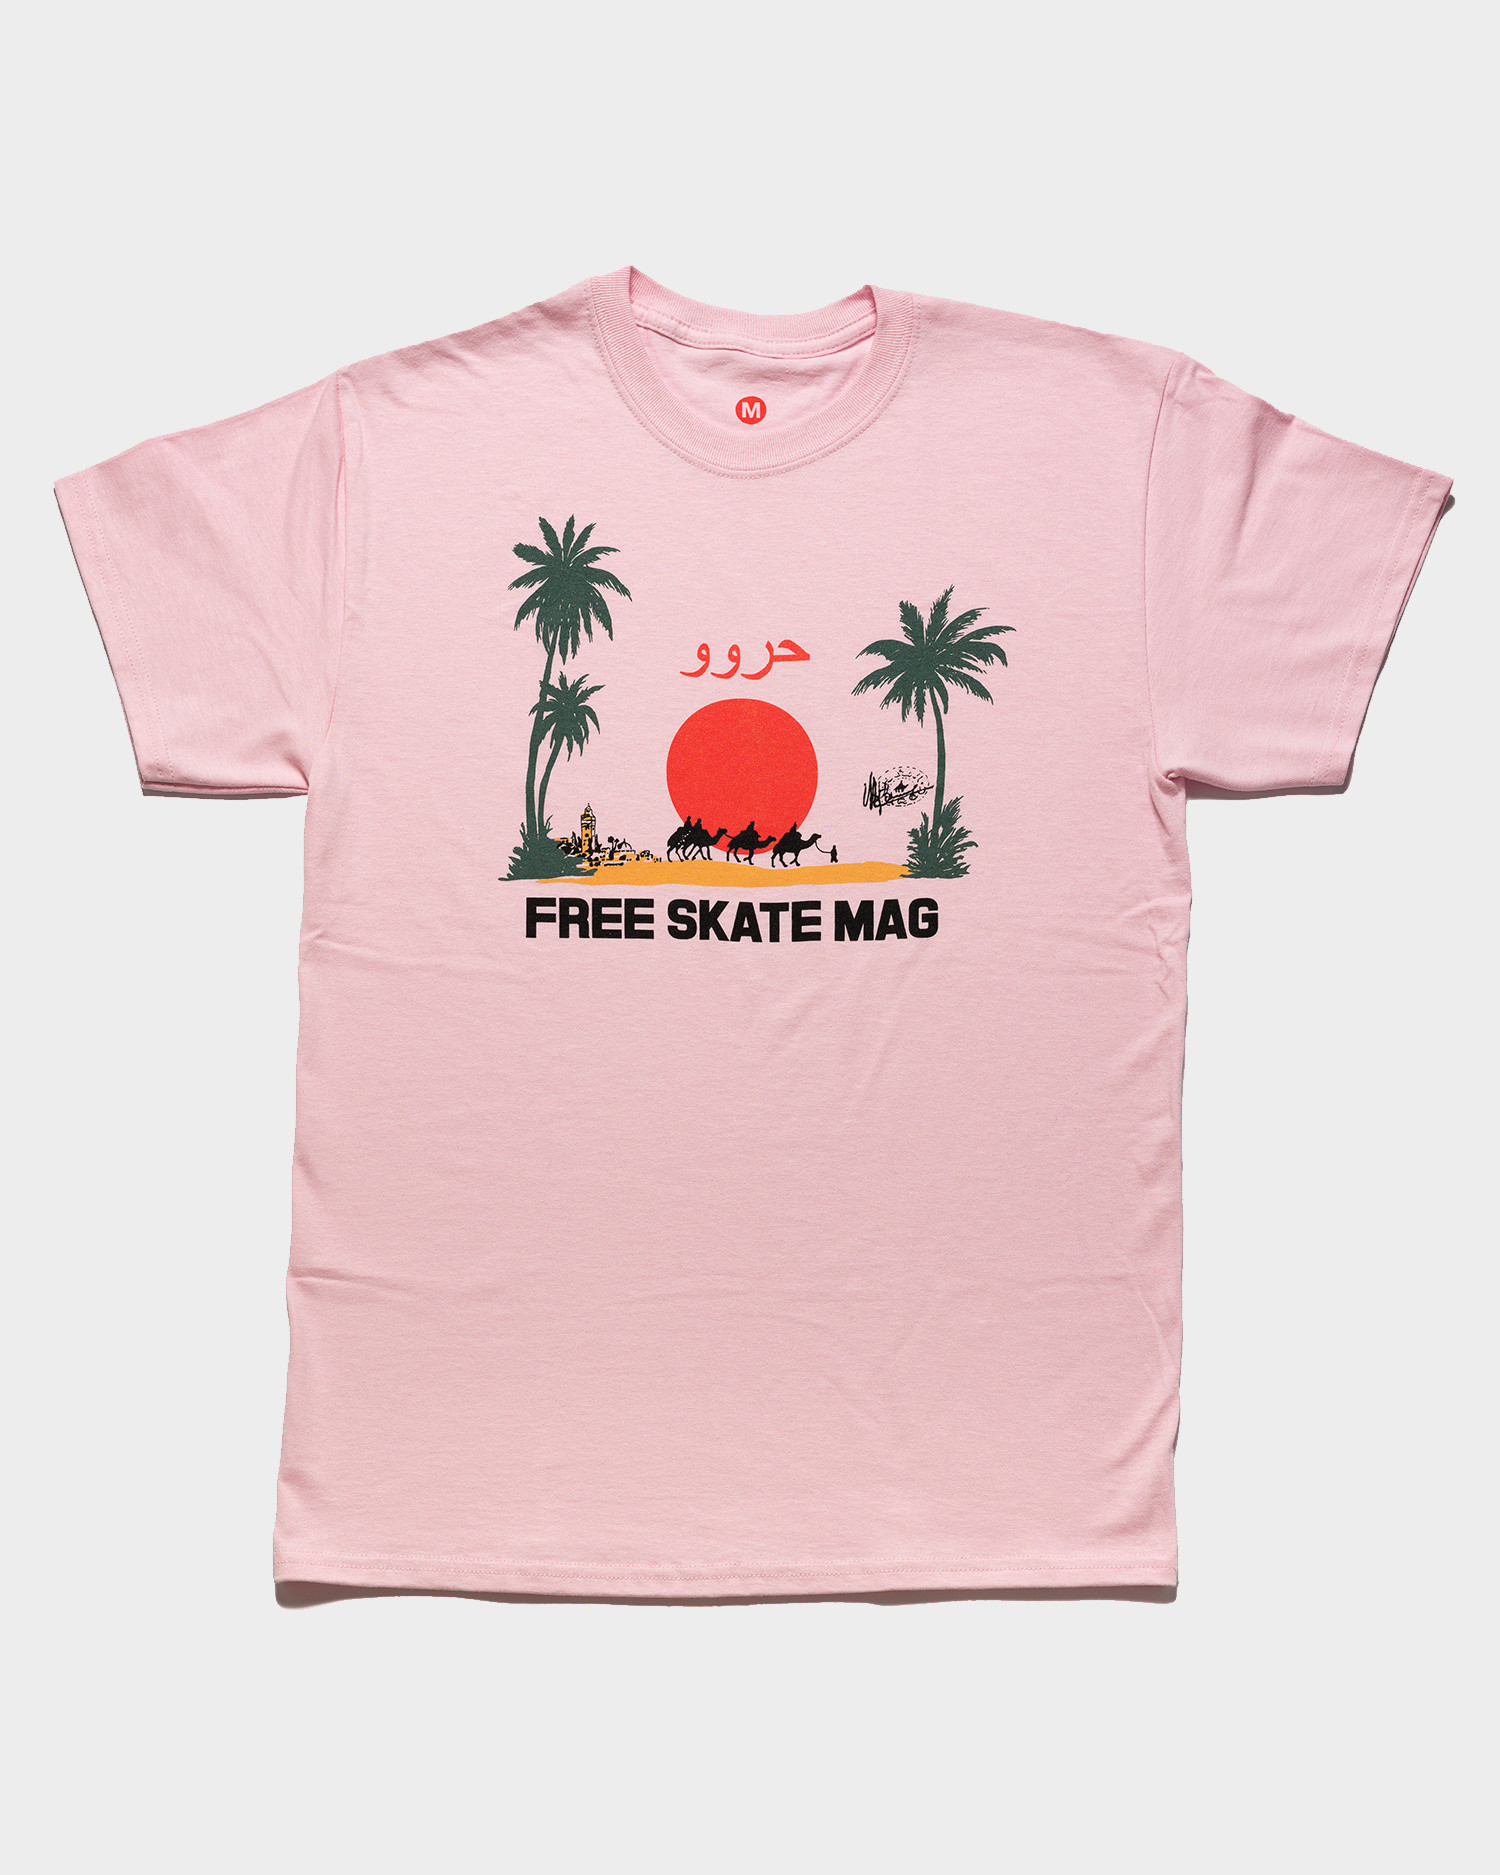 Free Skate Mag OG Marrakesh T-Shirt Pink